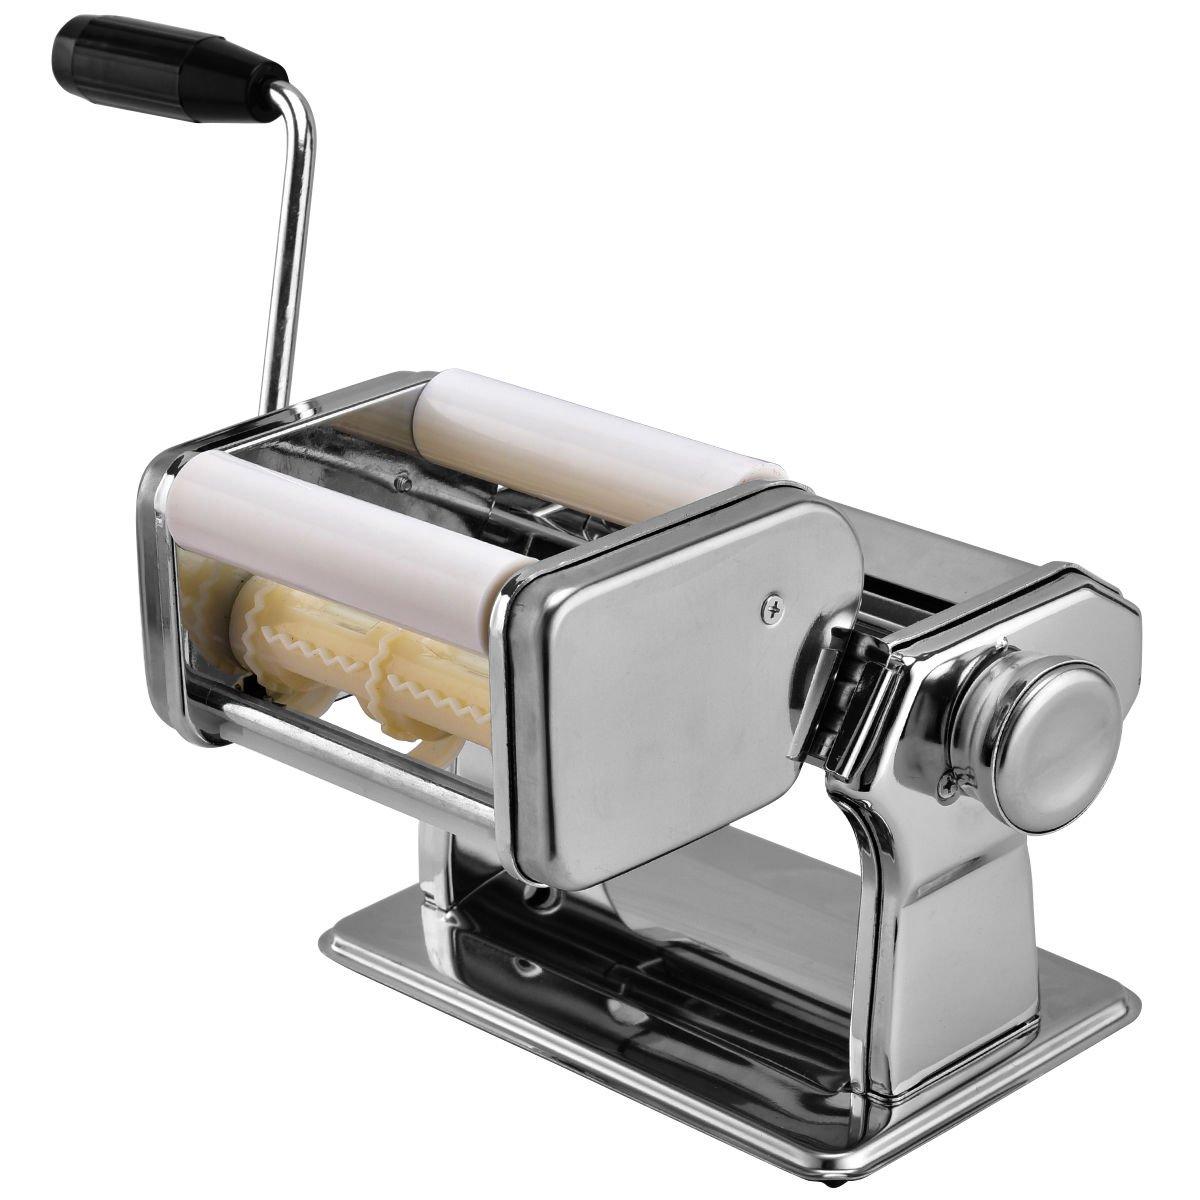 CHEFJOY 5 in 1 Professional Pasta Maker Stainless Steel Roller Cutter w/Clamp Lasagna Spaghetti Tagliatelle Ravioli Machine